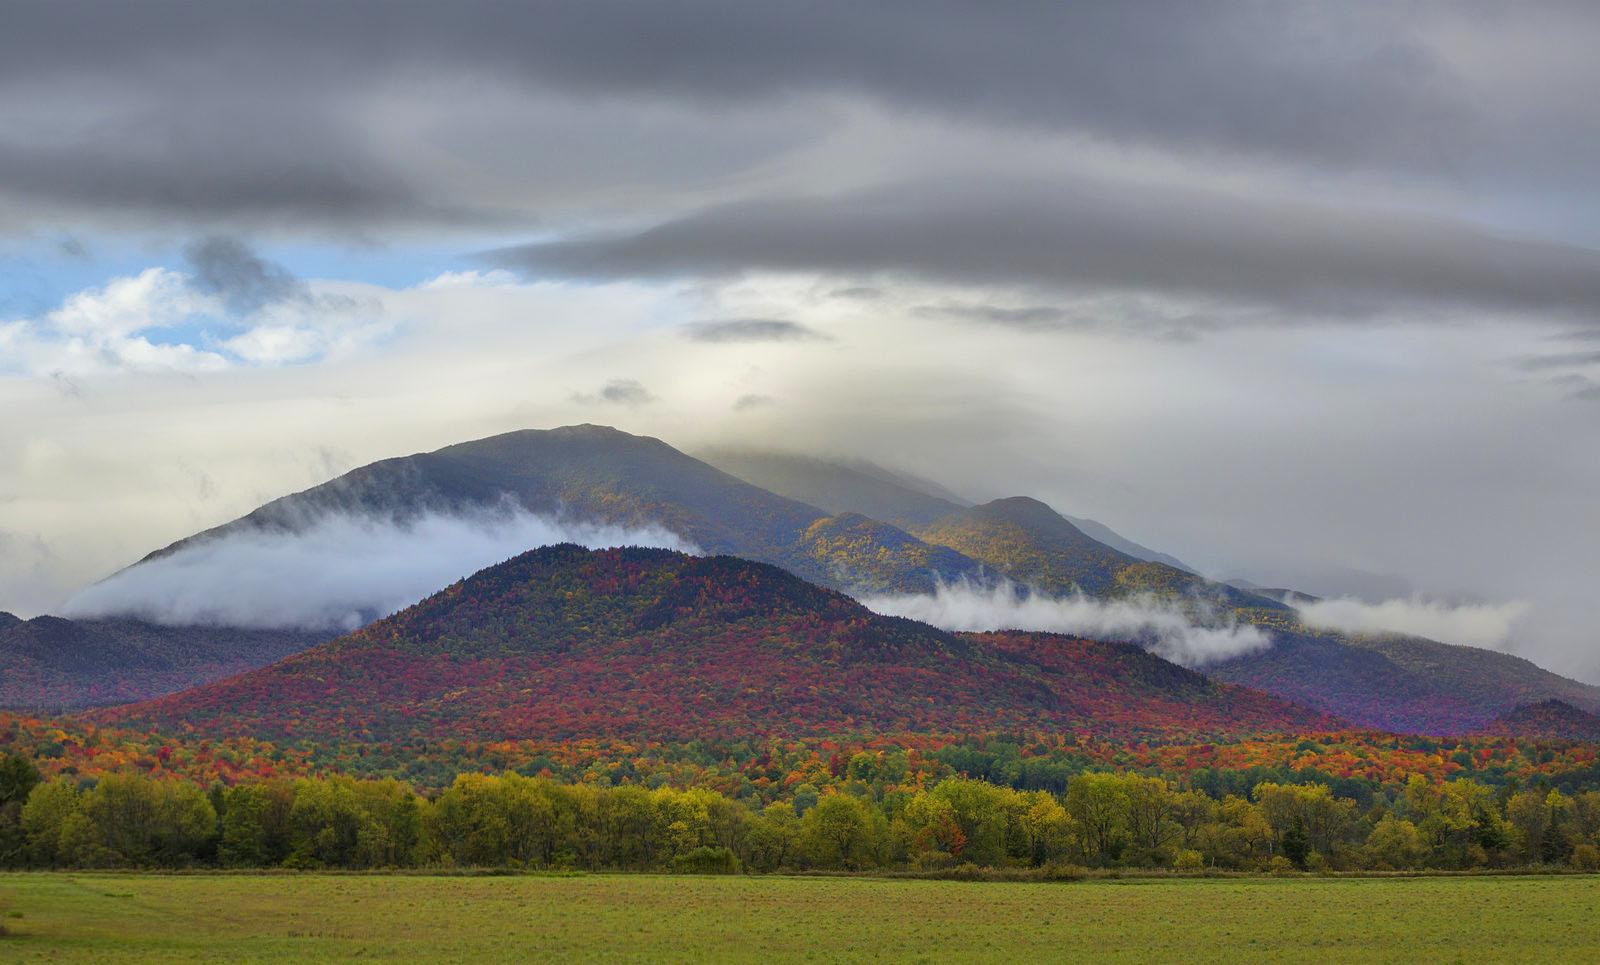 Algonquin-Range-clouds-Adirondack-Loj-Rd-fields_1600px.jpg